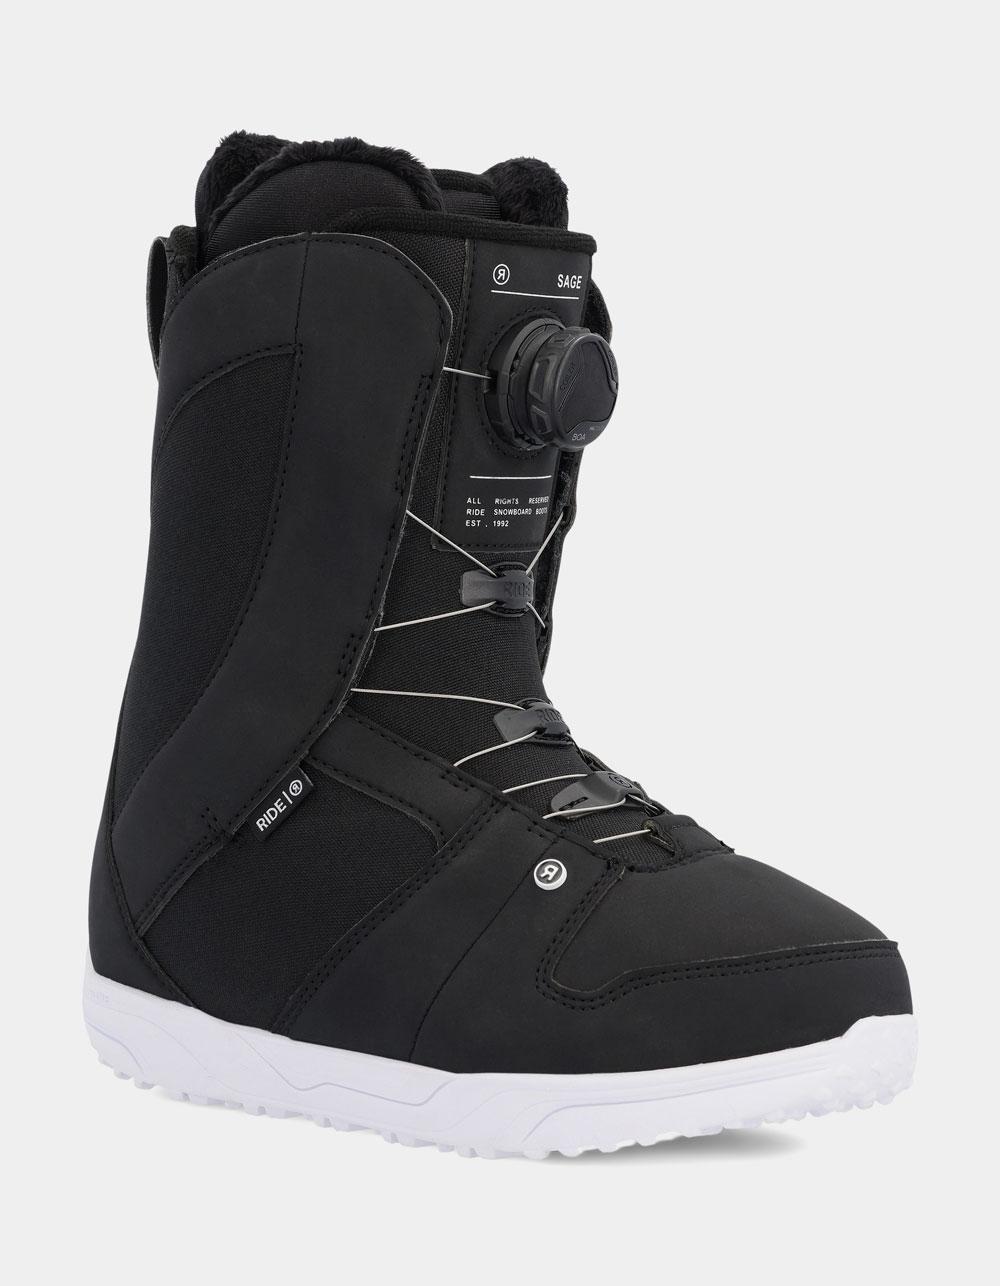 RIDE SNOWBOARDS Sage Snowboard Boots